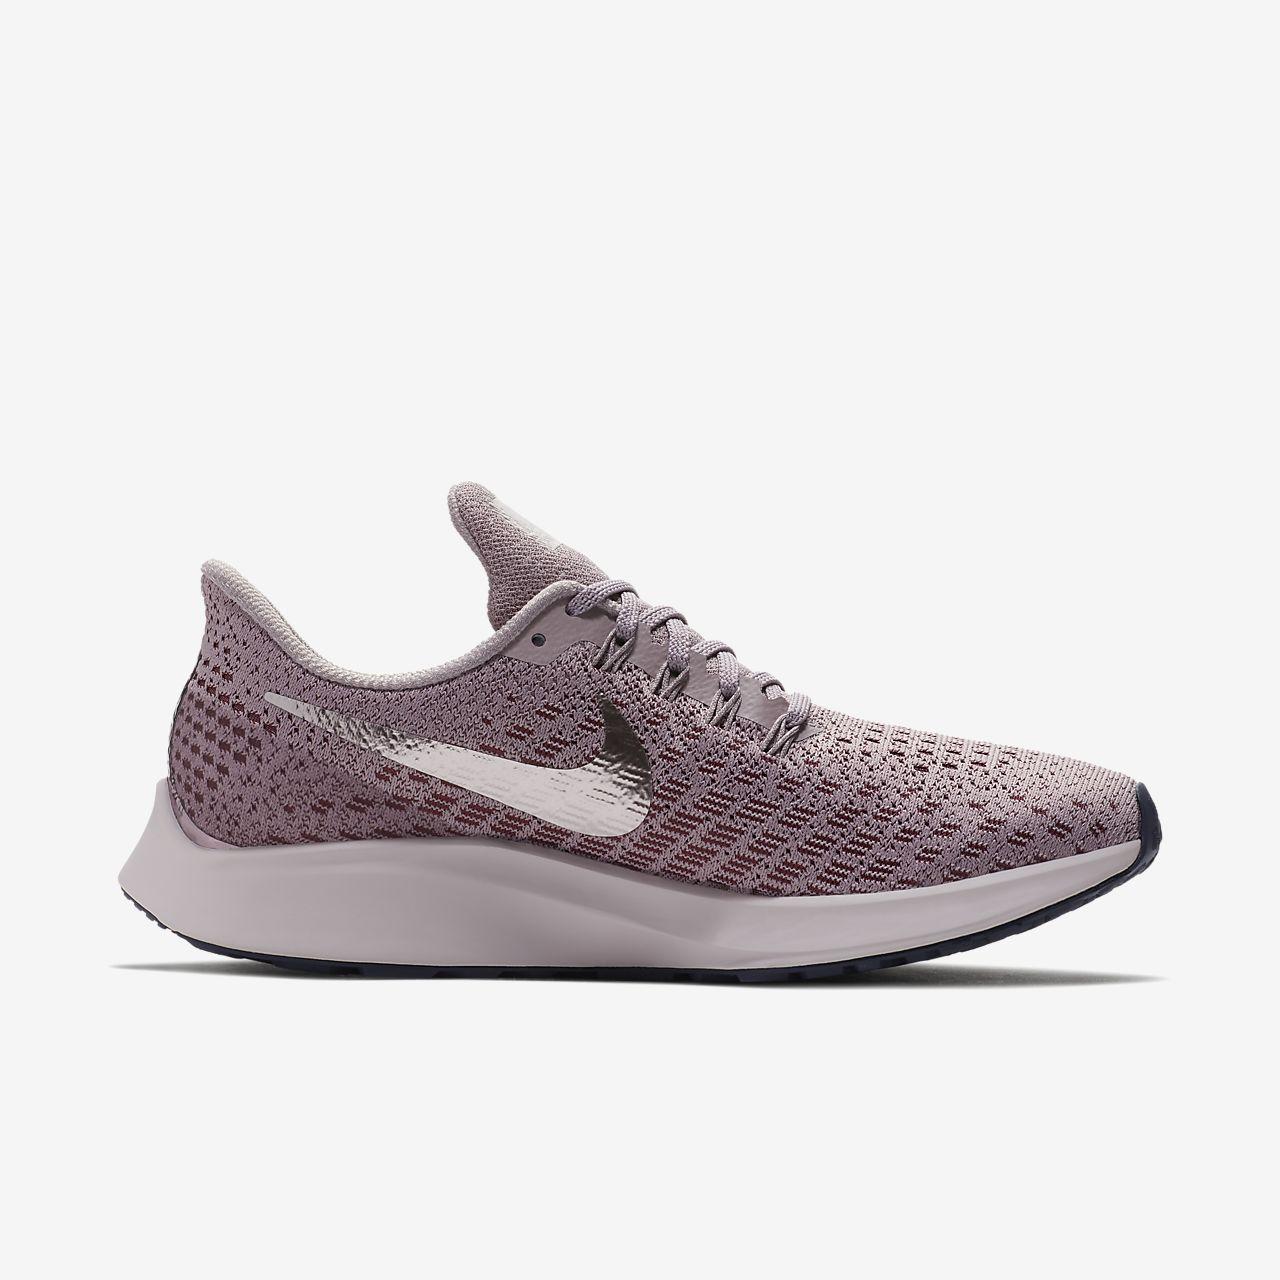 Nike Air Zoom Pegasus 35 Damen Laufschuhe Größe 42,5